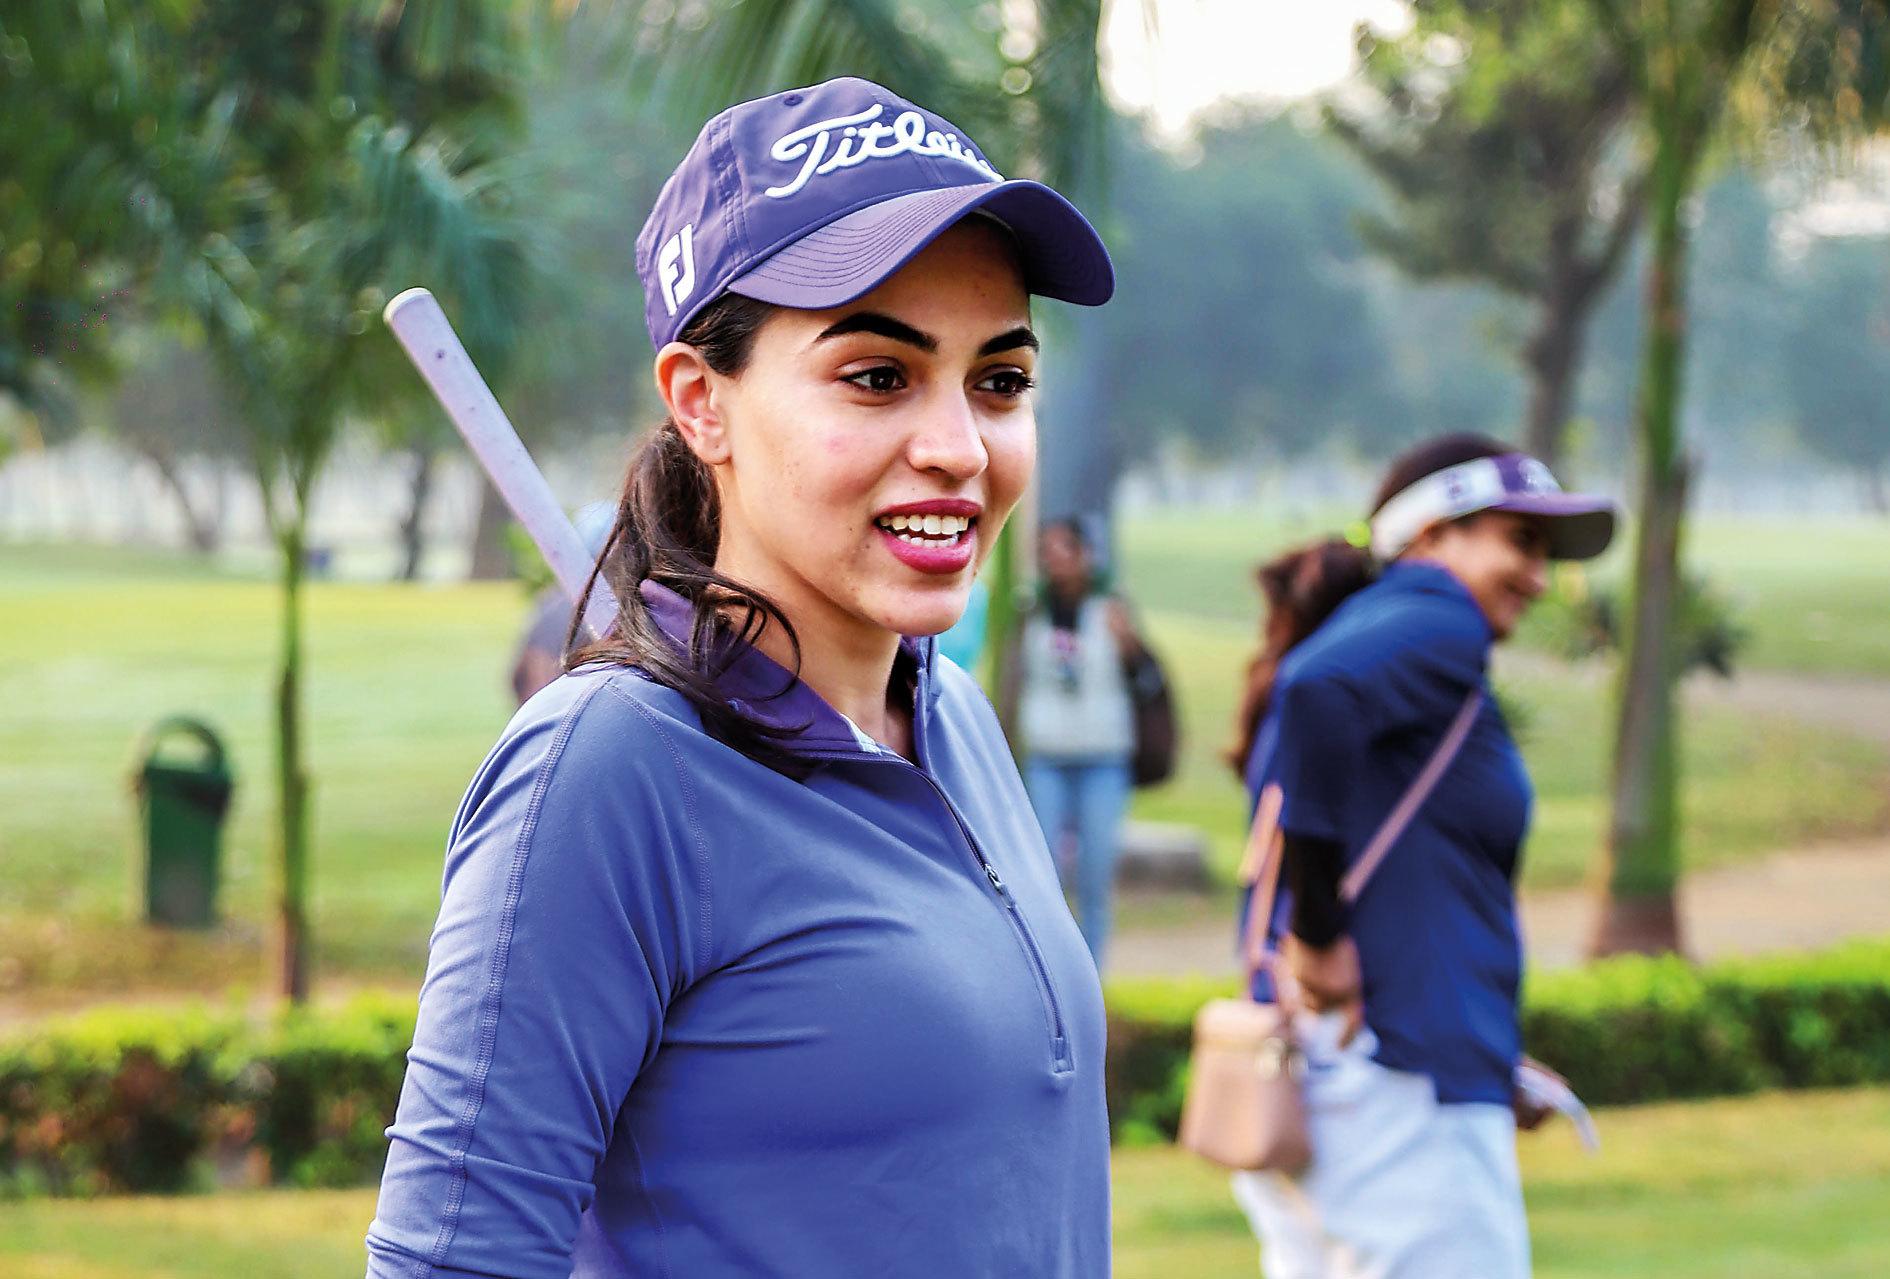 Gauri Monga from Delhi Golf Club